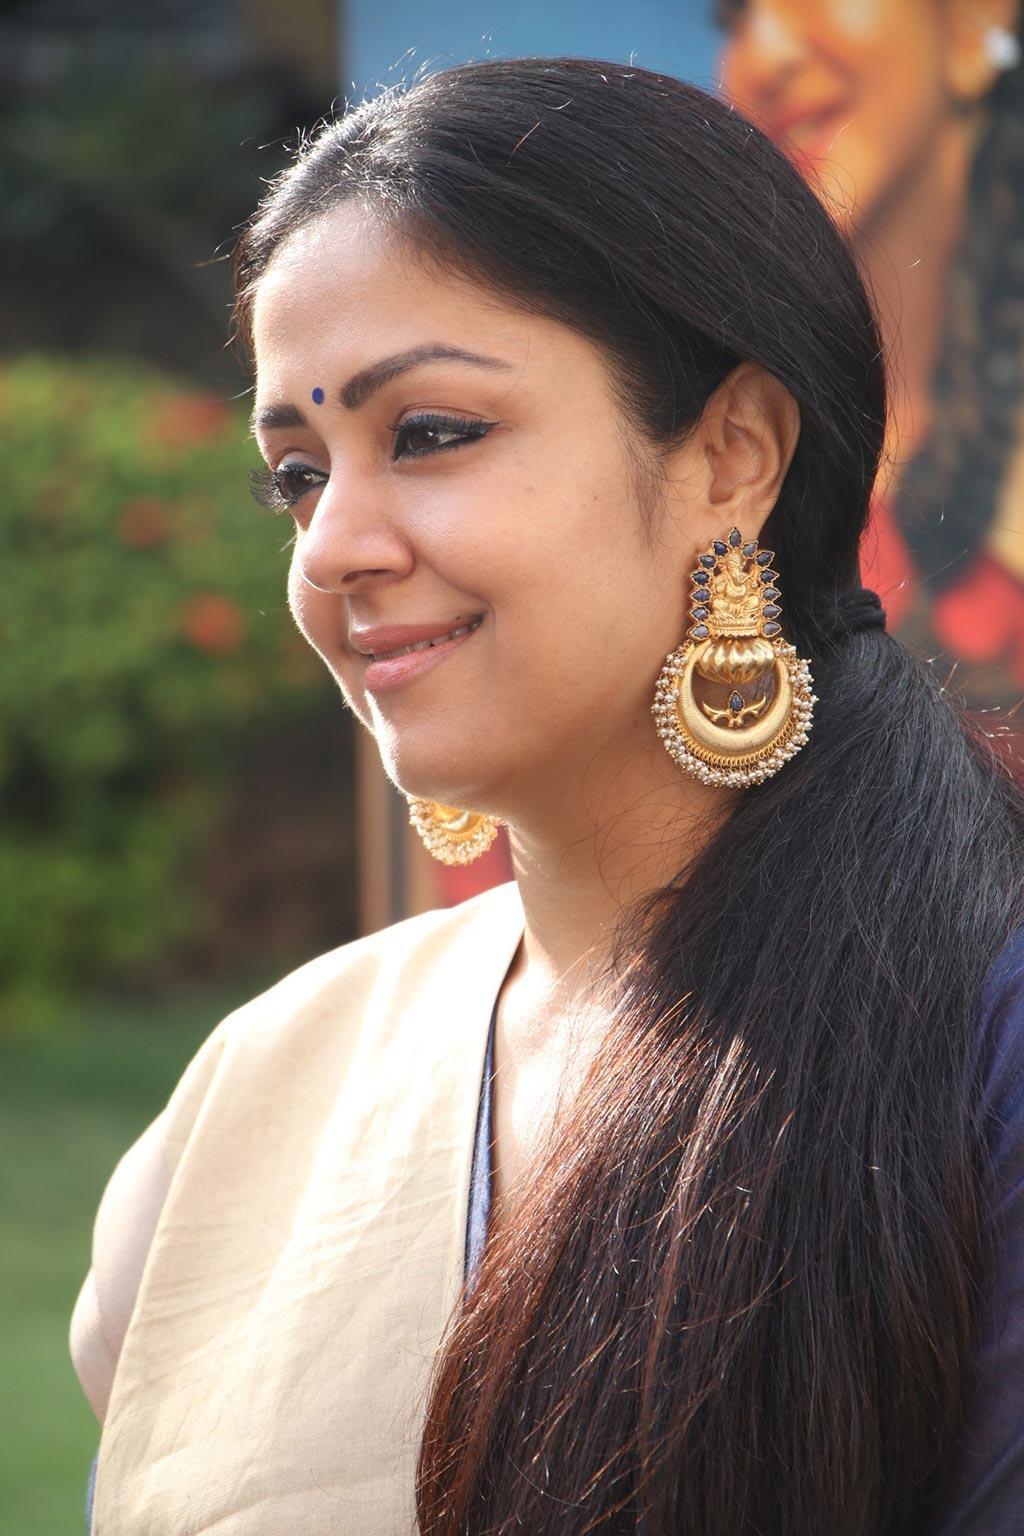 Jyothika HD Wallpapers - Top Free Jyothika HD Backgrounds ...